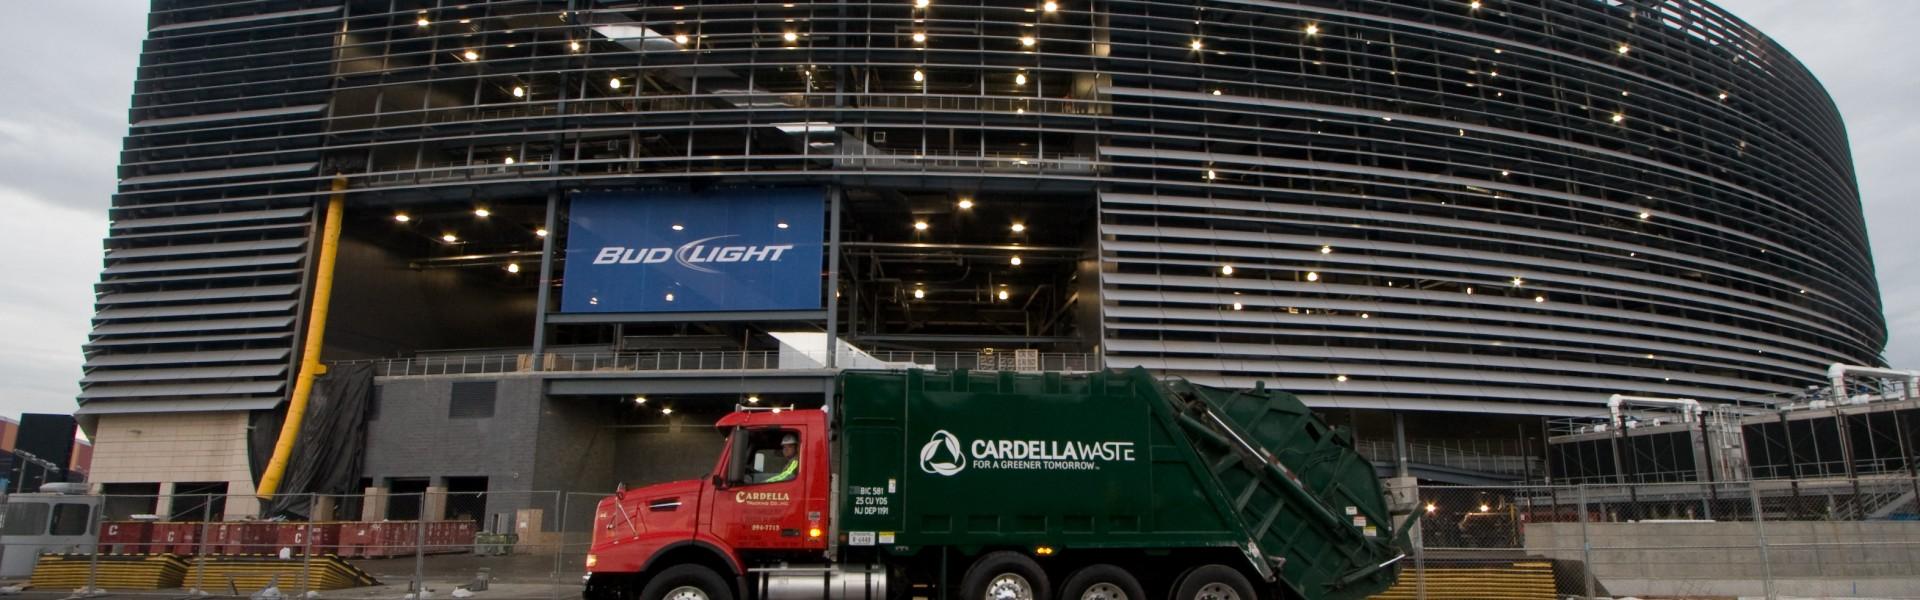 Construction Waste Management Services